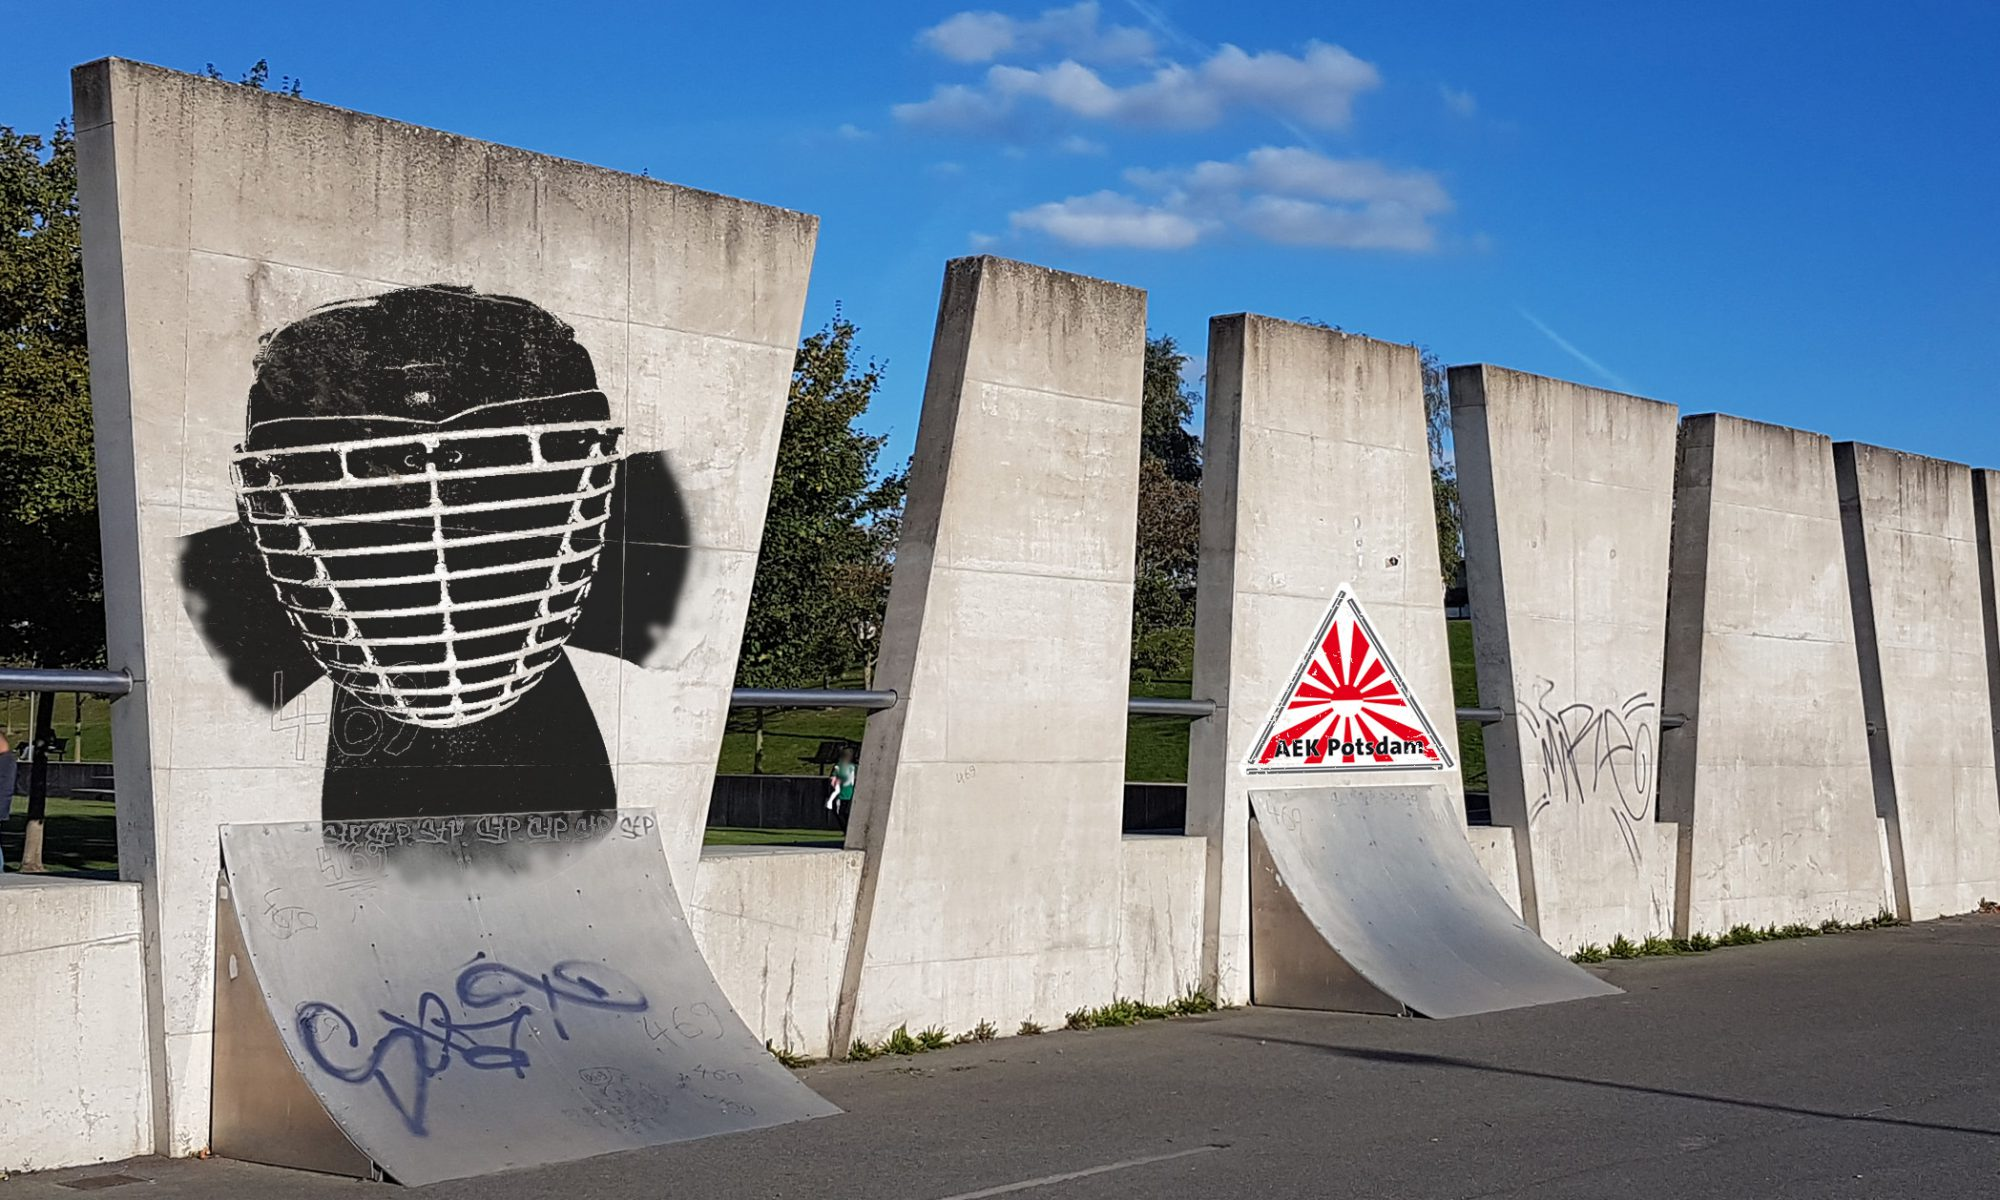 AEK Potsdam